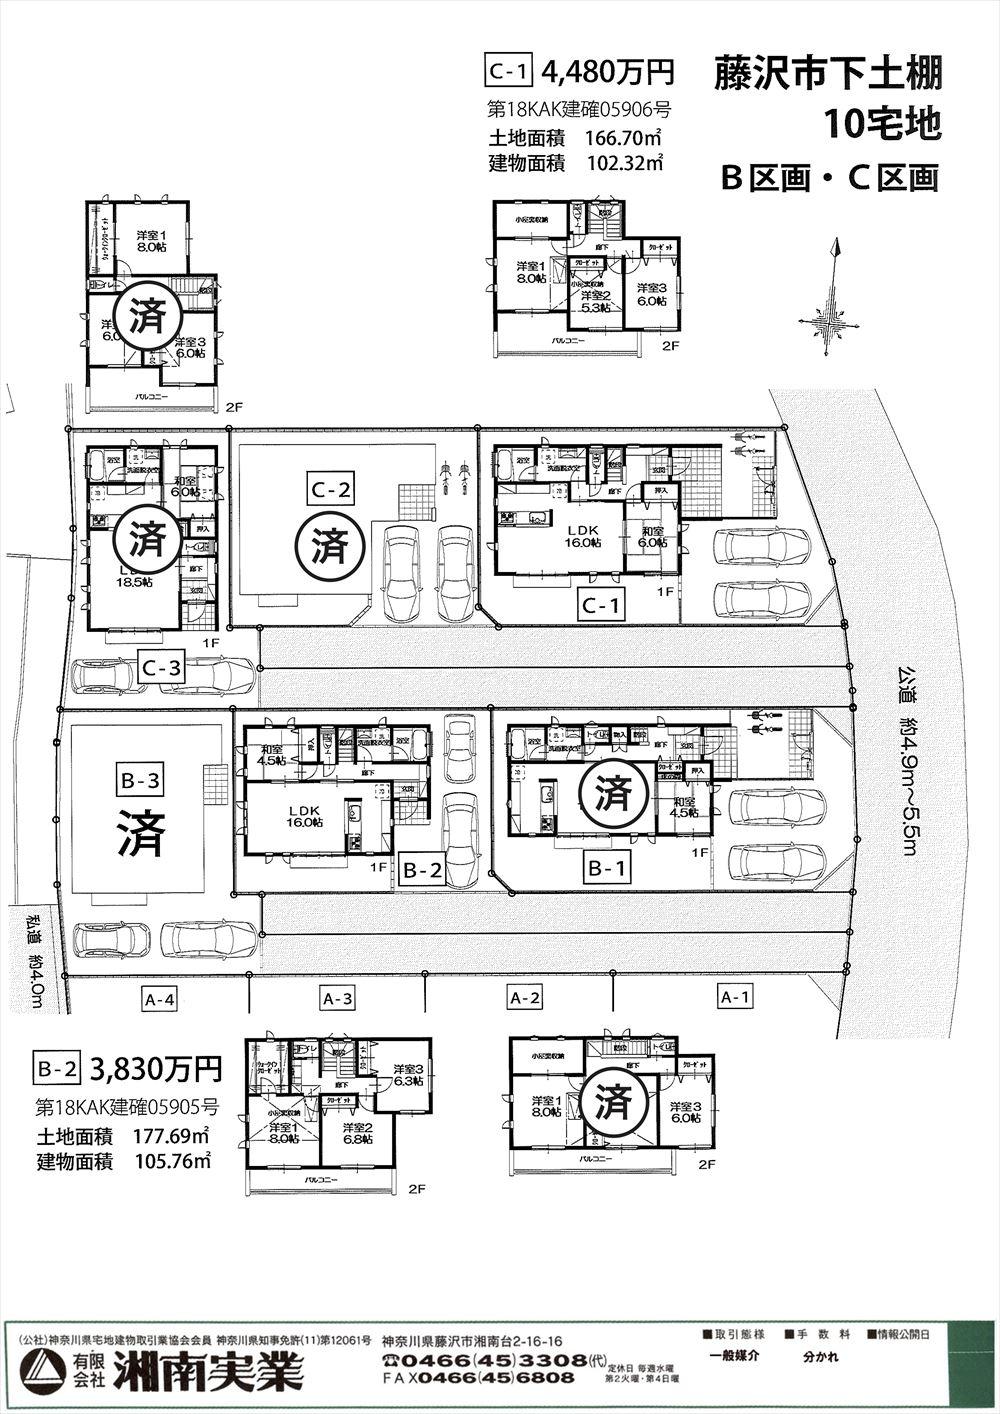 藤沢市下土棚 新築戸建て分譲の販売 3,830万円~